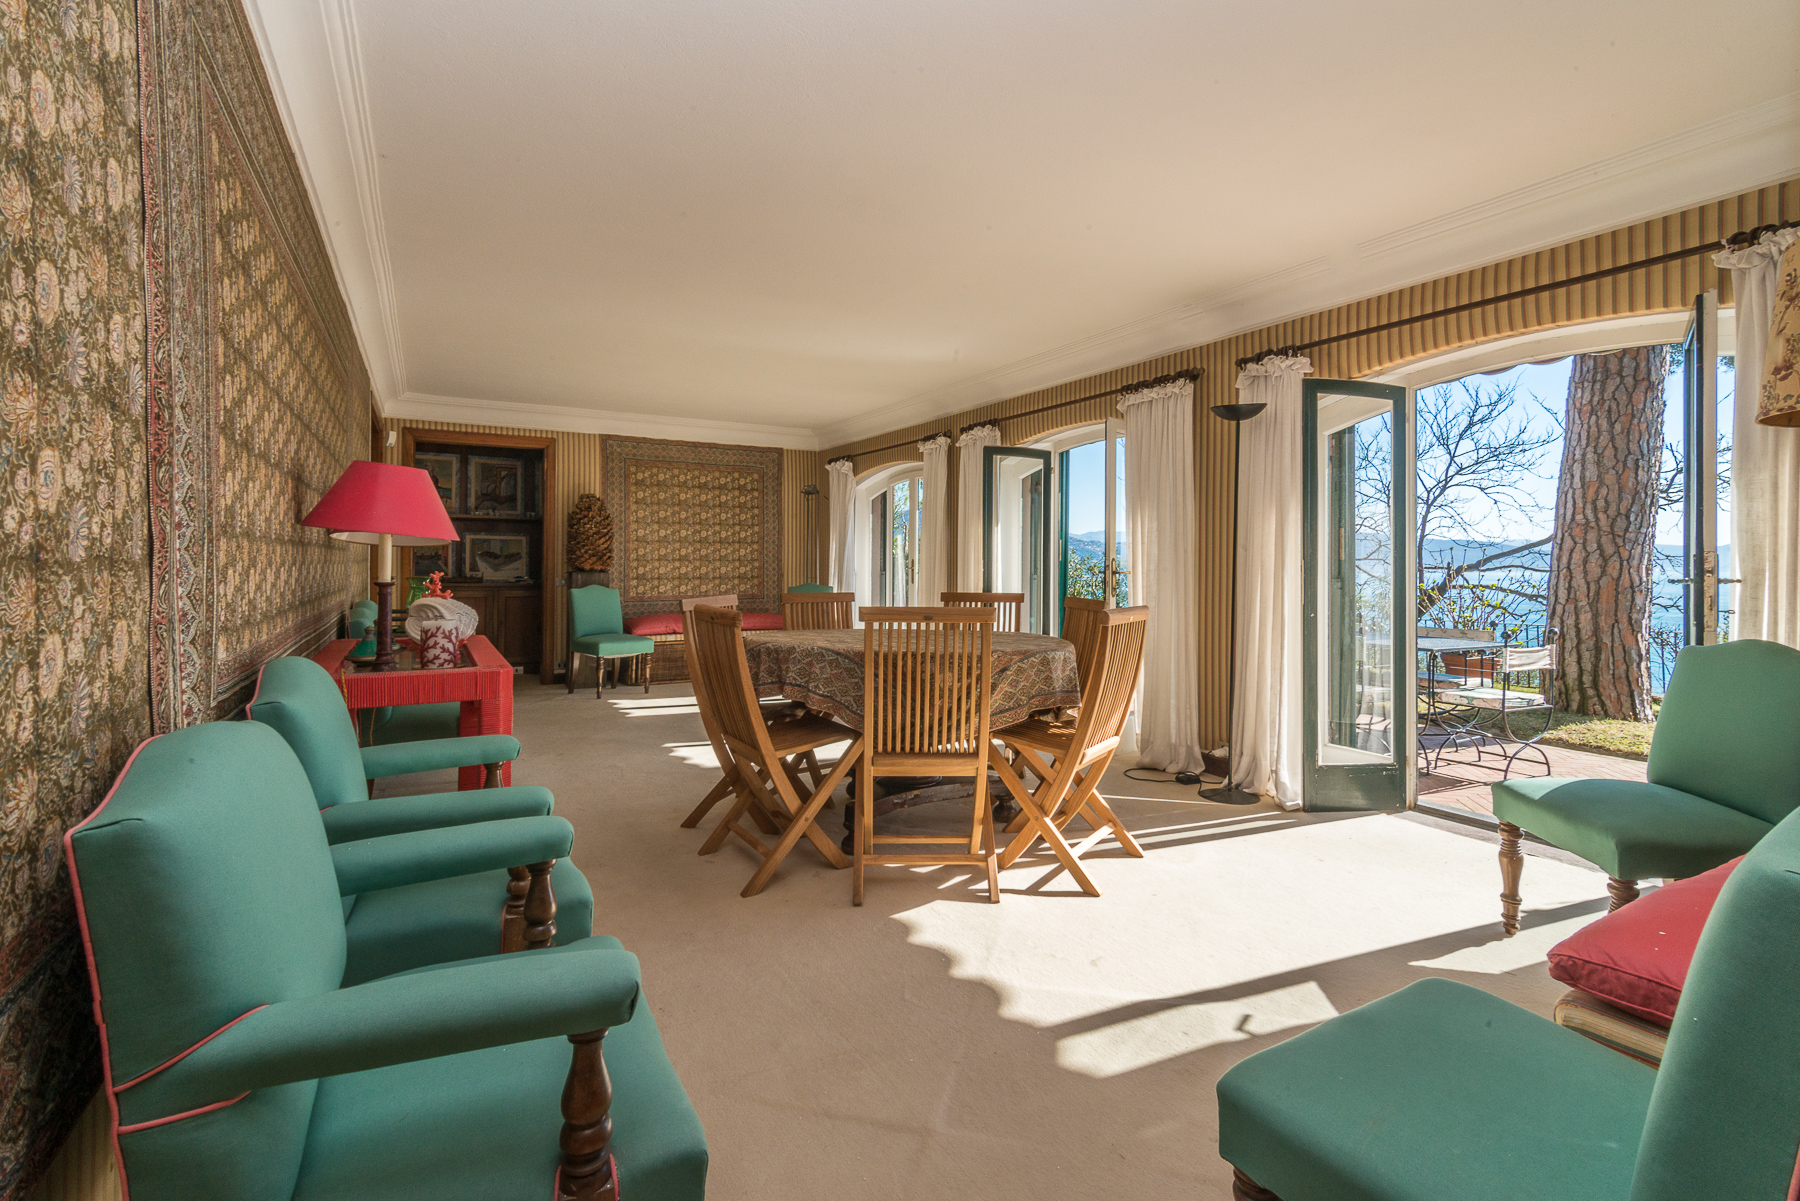 Villa in Vendita a Santa Margherita Ligure: 5 locali, 440 mq - Foto 10